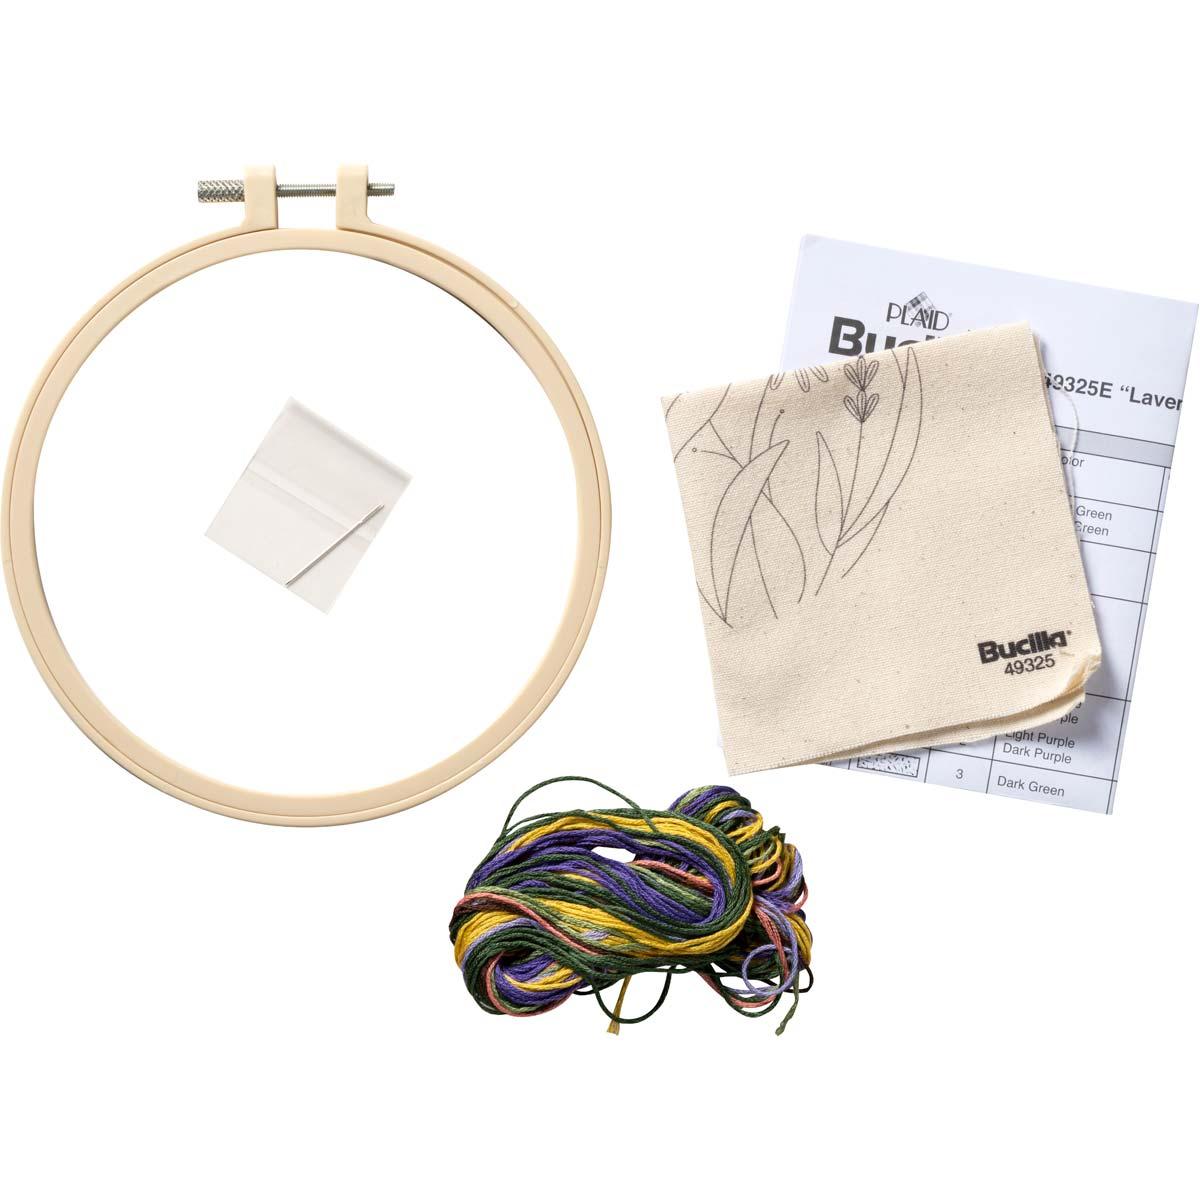 Bucilla ® Stamped Embroidery - Lavender Fields - 49325E